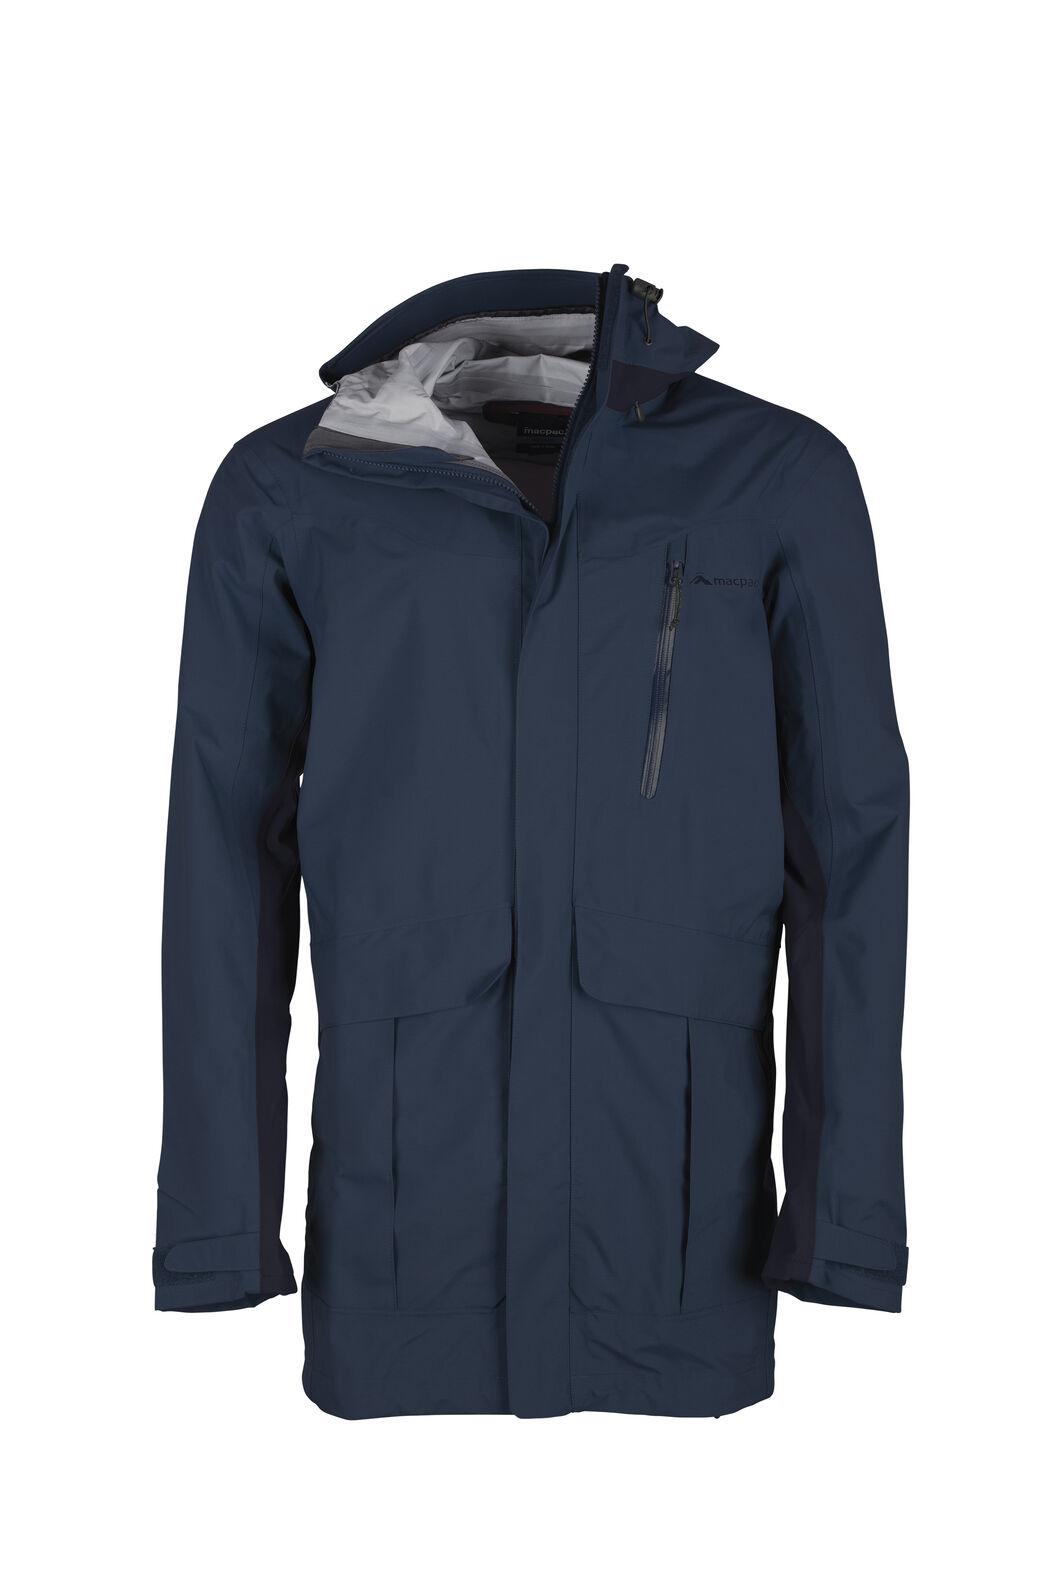 Macpac Copland Long Rain Jacket - Men's, Estate Blue/Black Iris, hi-res